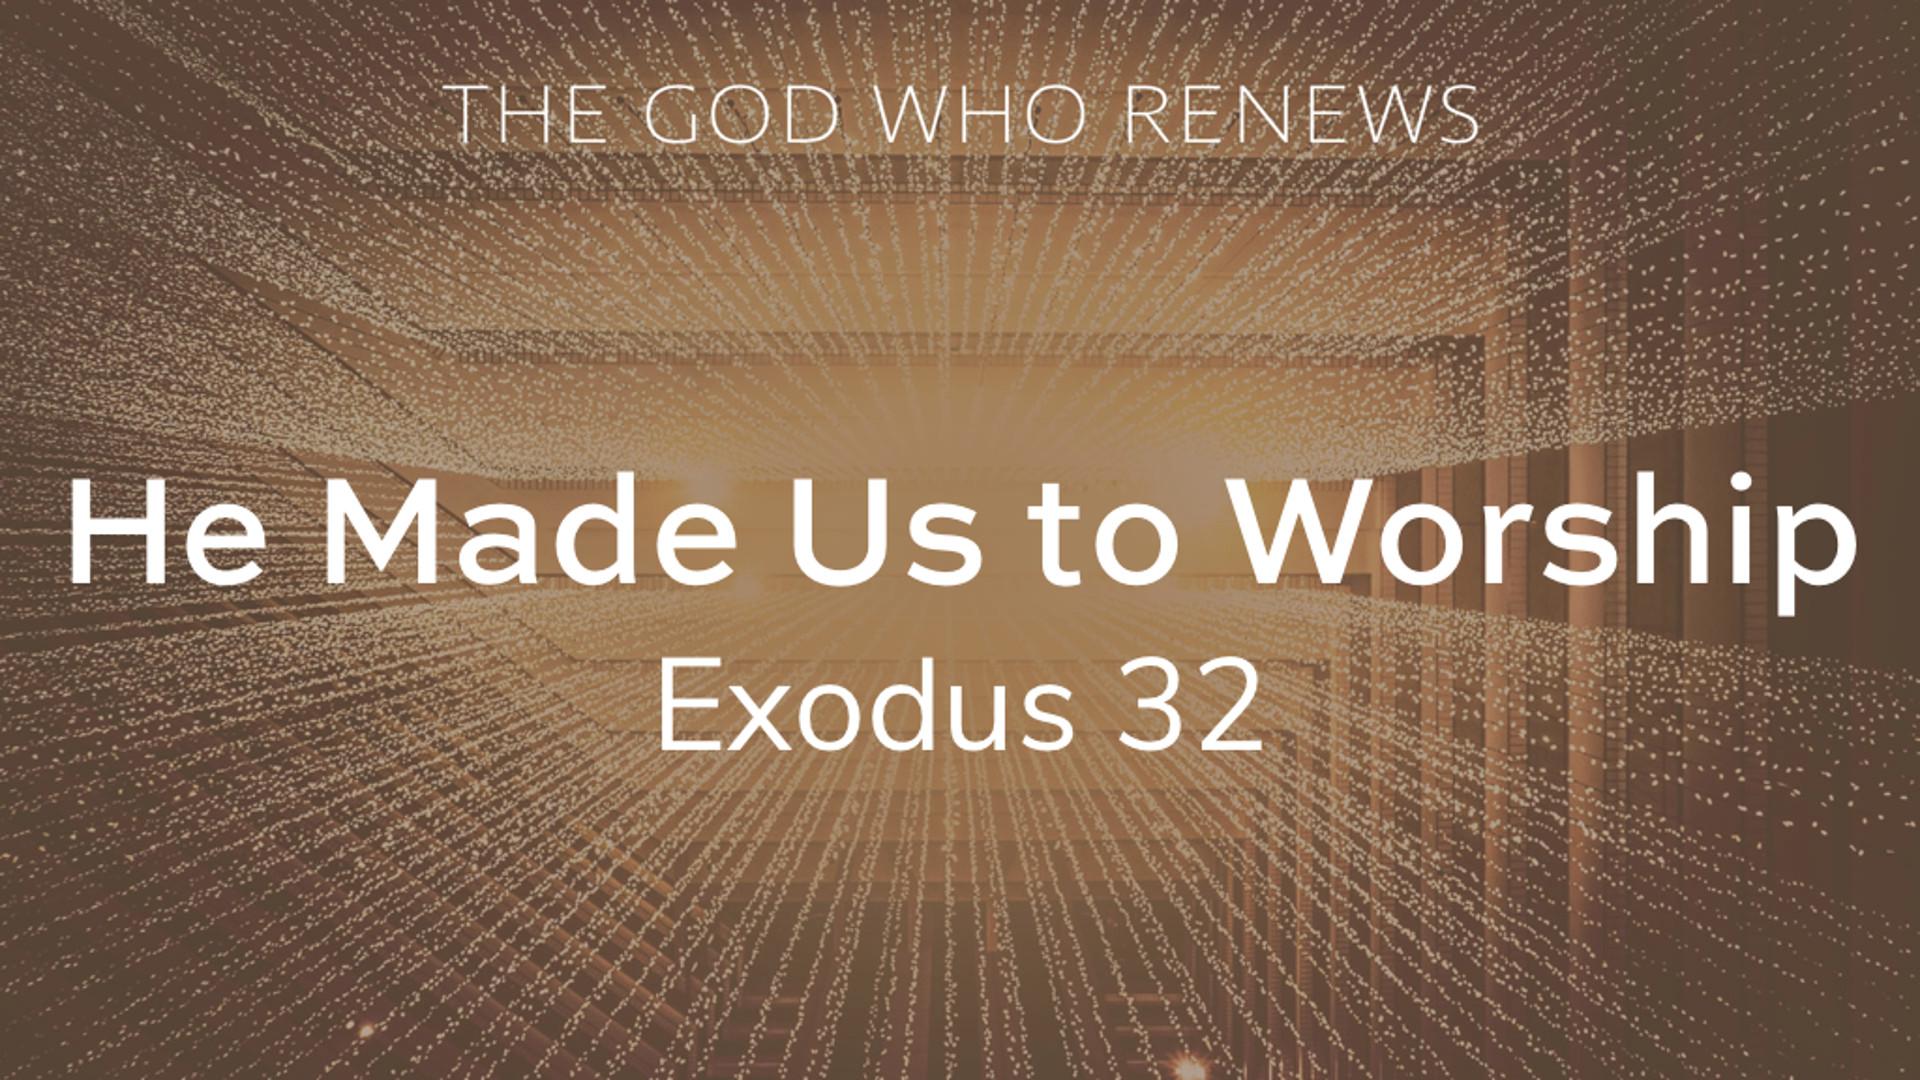 Exodus 32 - He Made Us to Worship.jpg